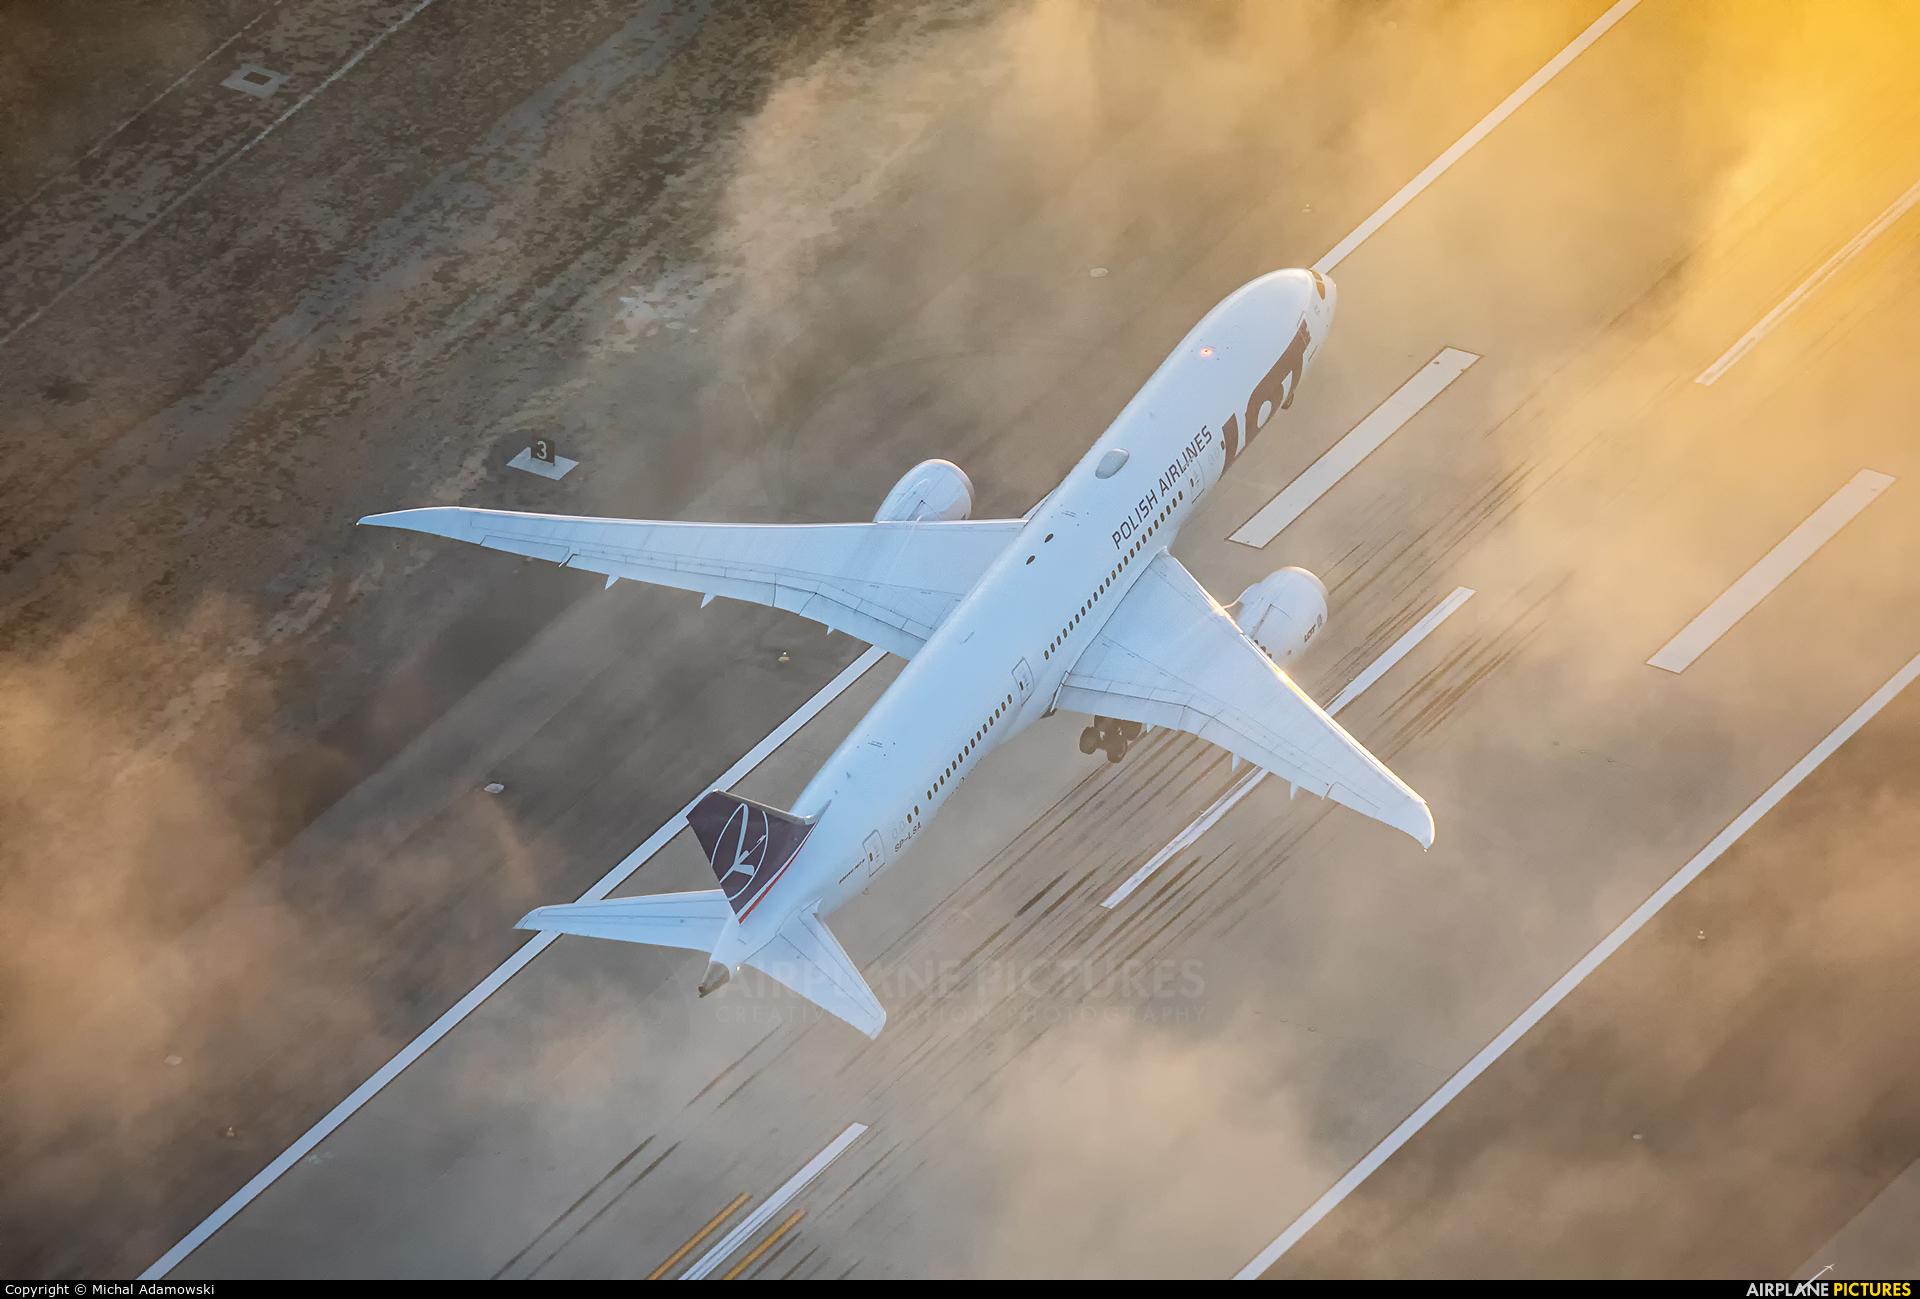 LOT - Polish Airlines SP-LSA aircraft at In Flight - California